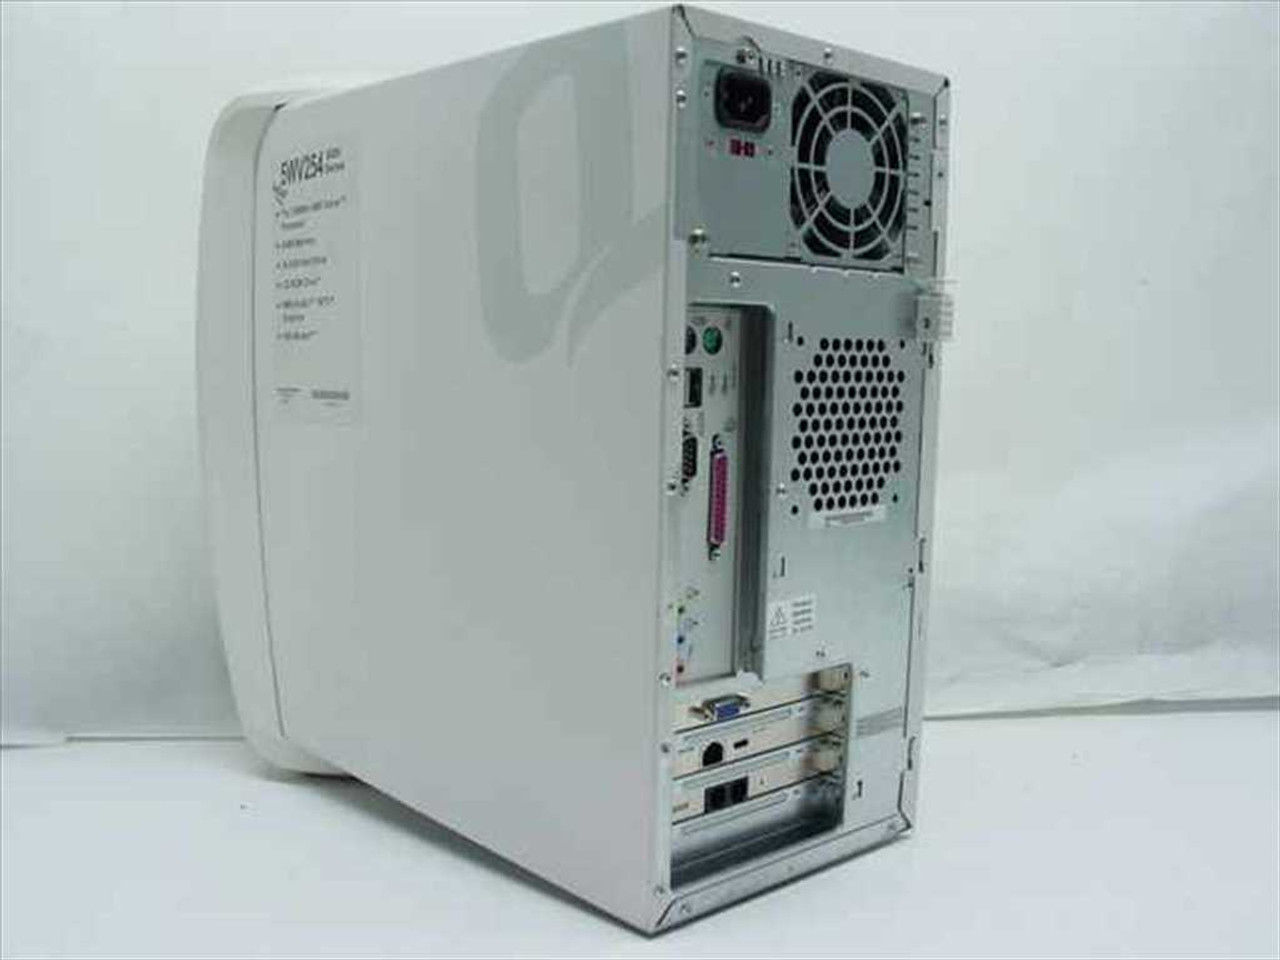 Compaq 5wv254 Presario 5000 Series Pc Tower Wiring Diagram